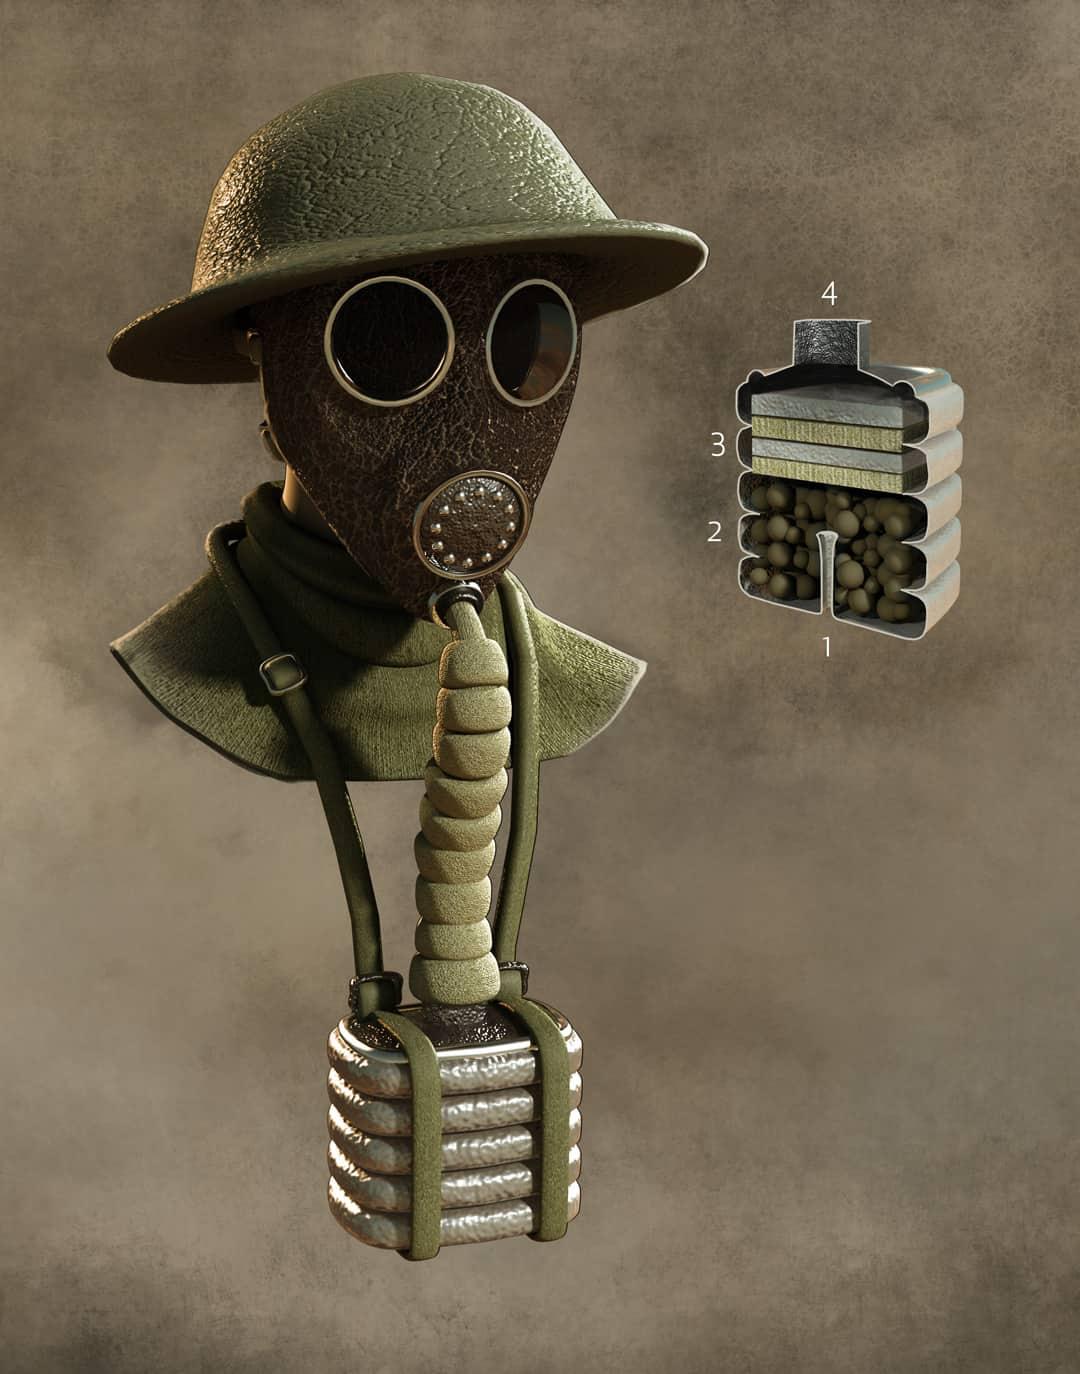 World War One Technology, Quo Magazine July 2014. Detail of the Small Box Respirator. Art by Román García Mora.